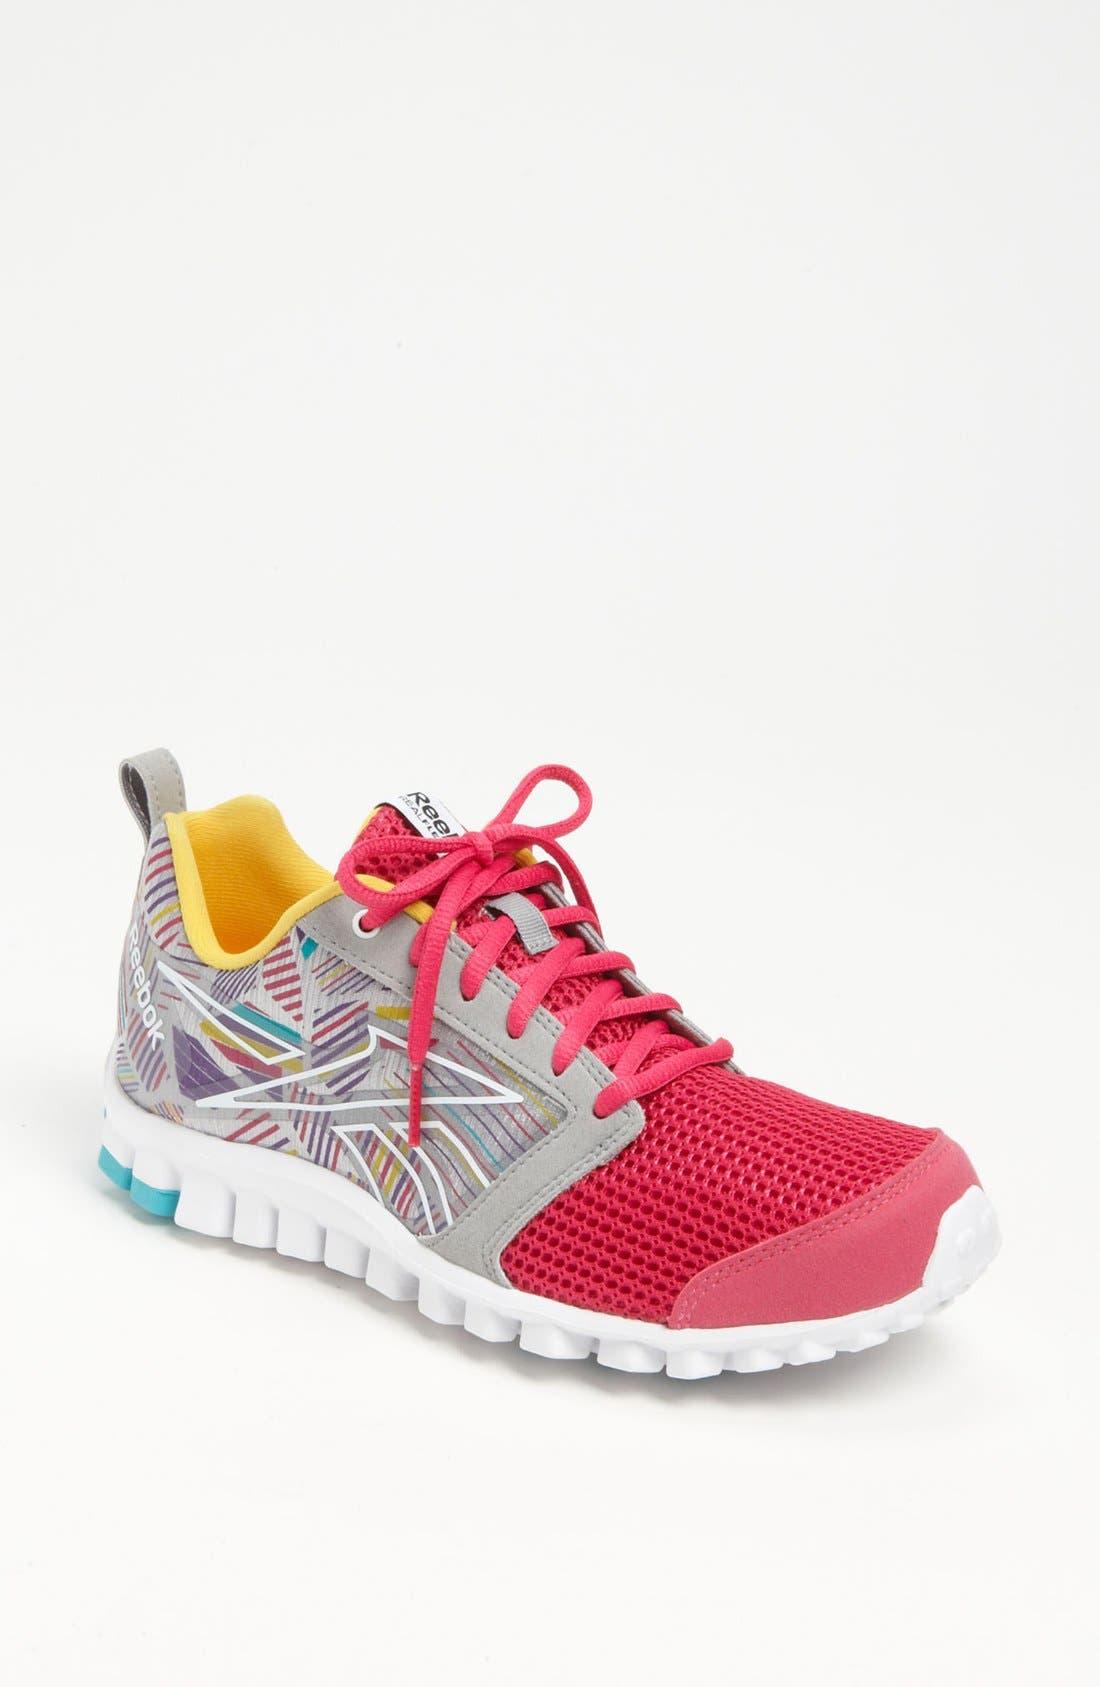 Main Image - Reebok 'RealFlex Scream 2.0' Running Shoe (Women)